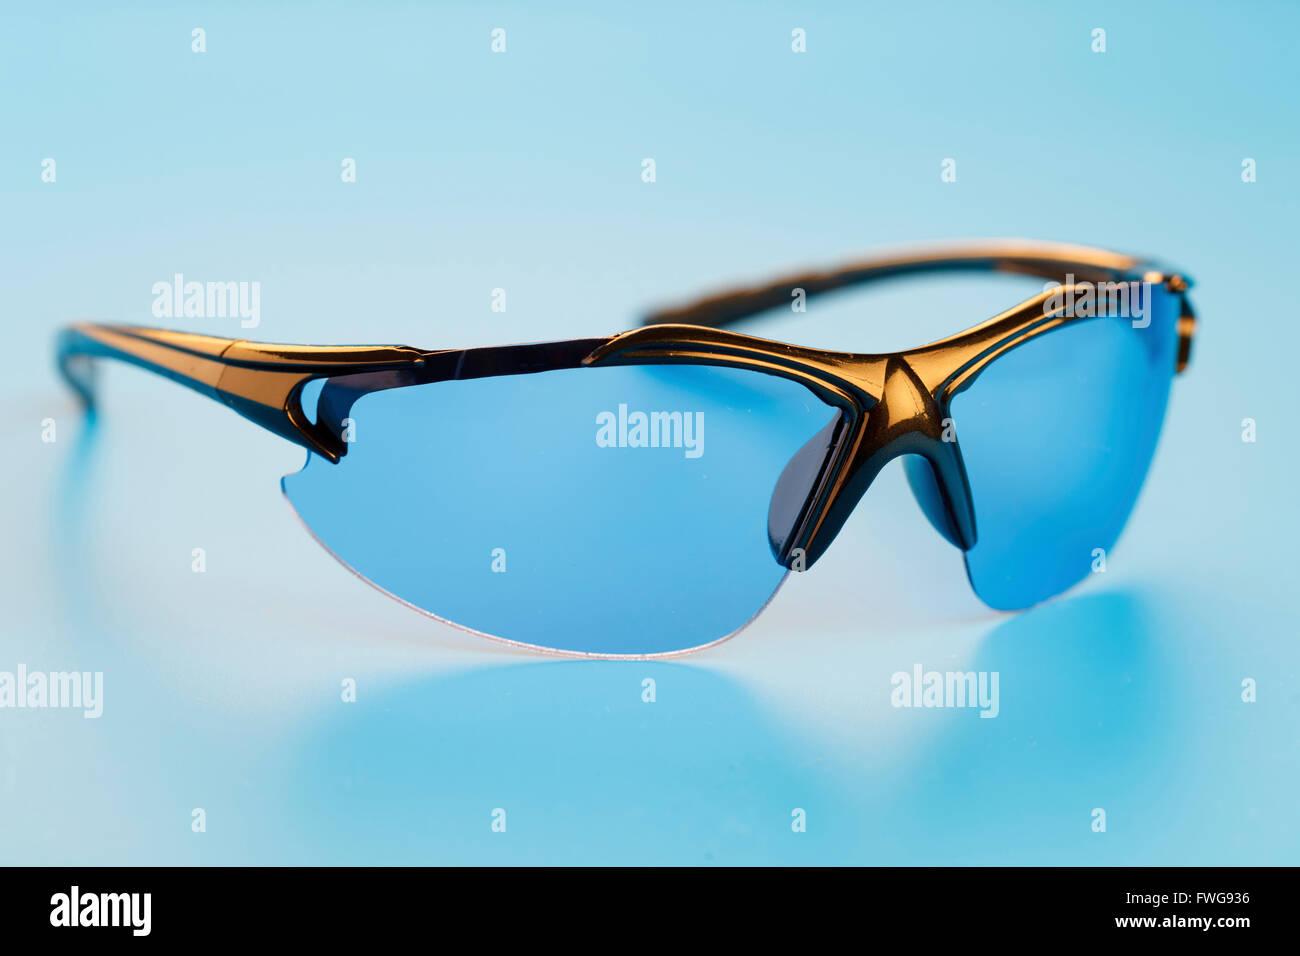 Eyeglasses against a blue background. - Stock Image